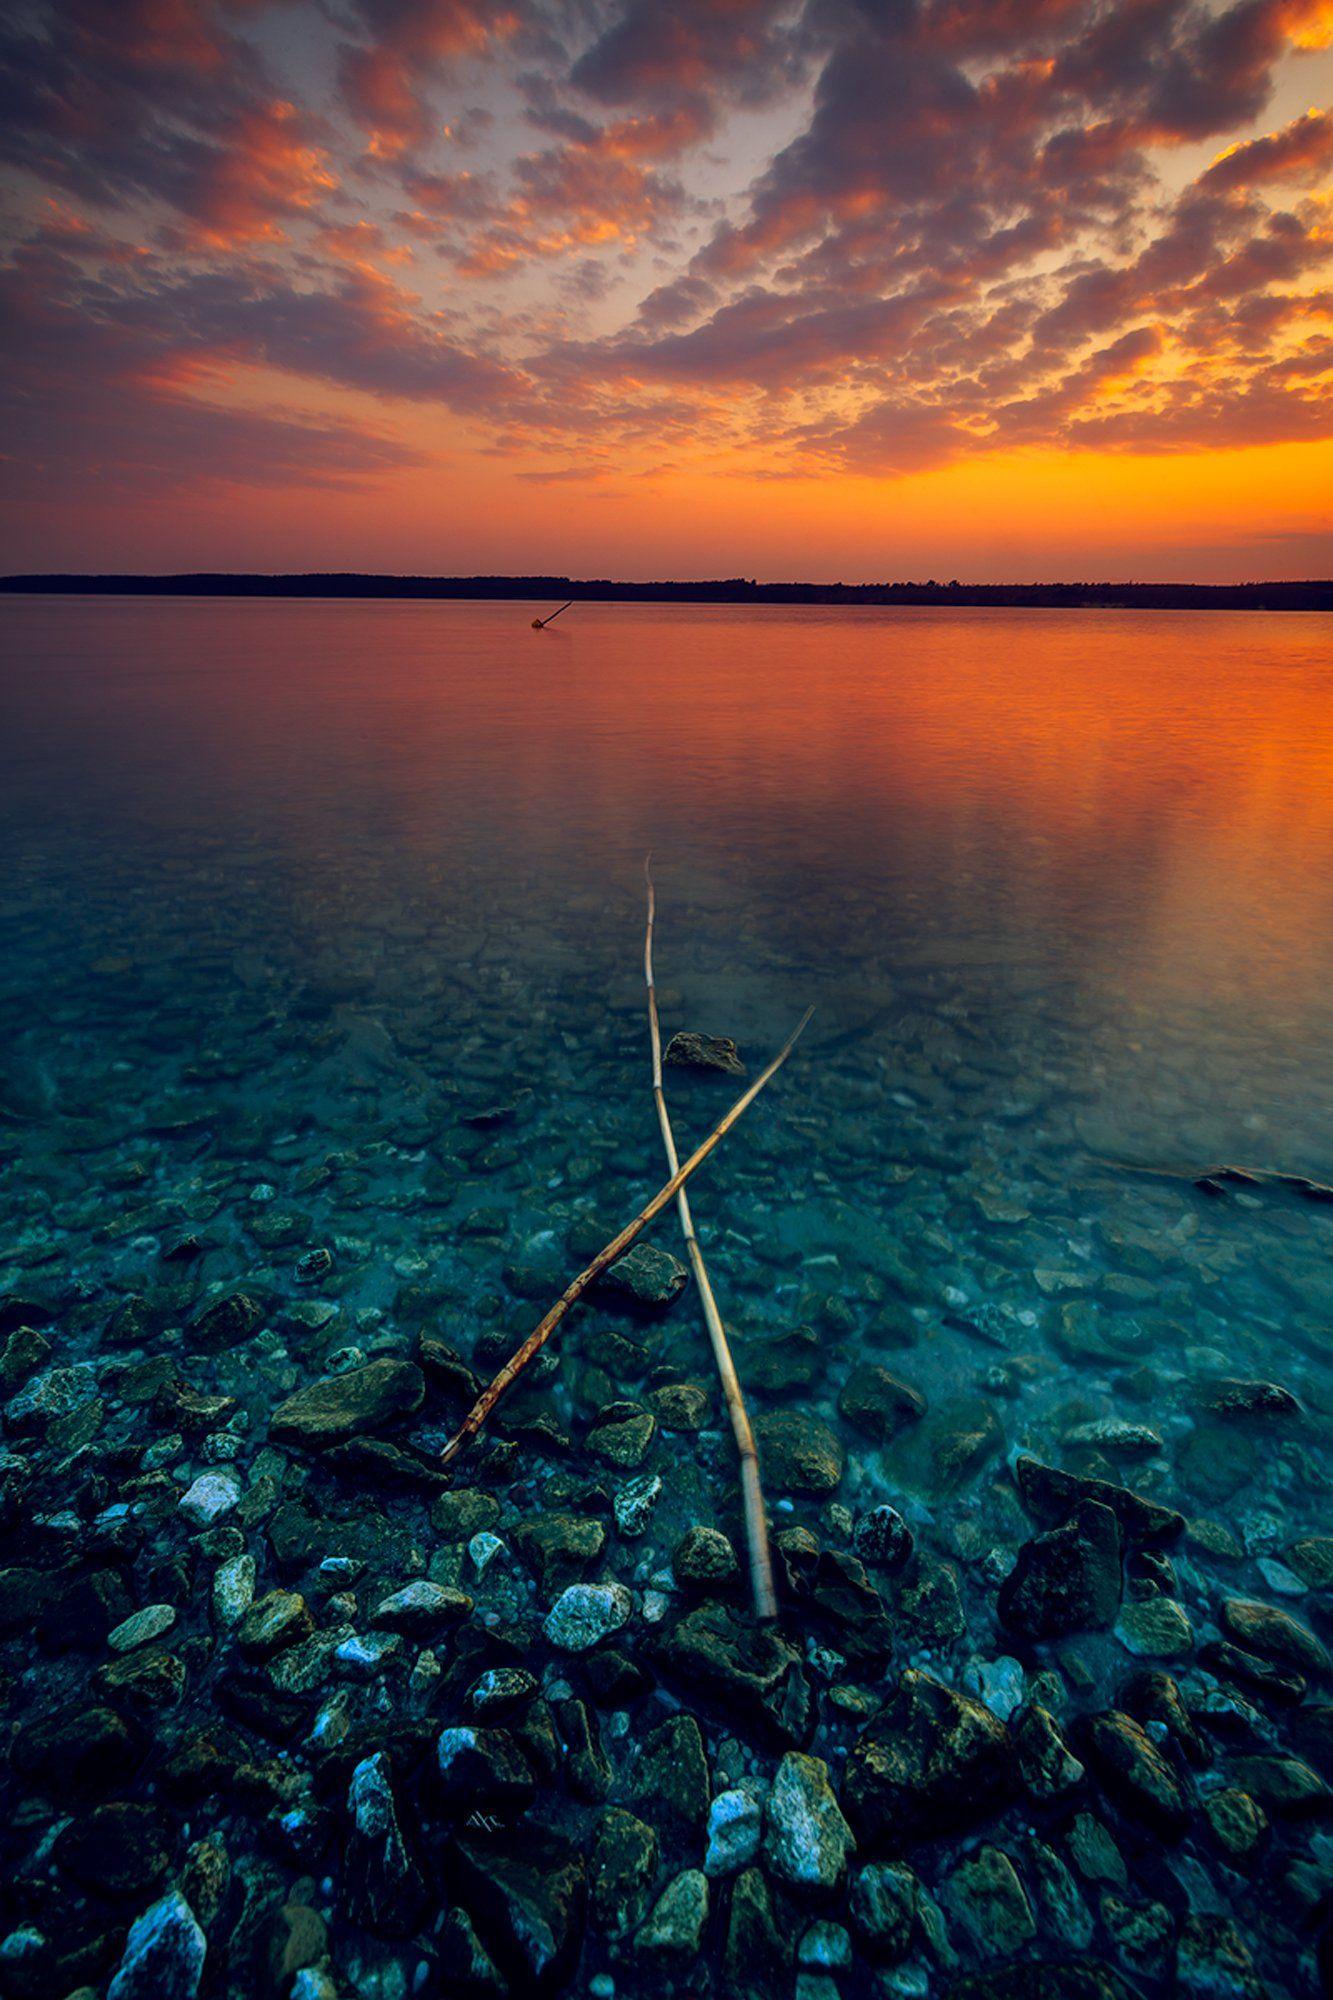 landscape, seascape, baltic sea, sunset, Руслан Болгов (Axe)